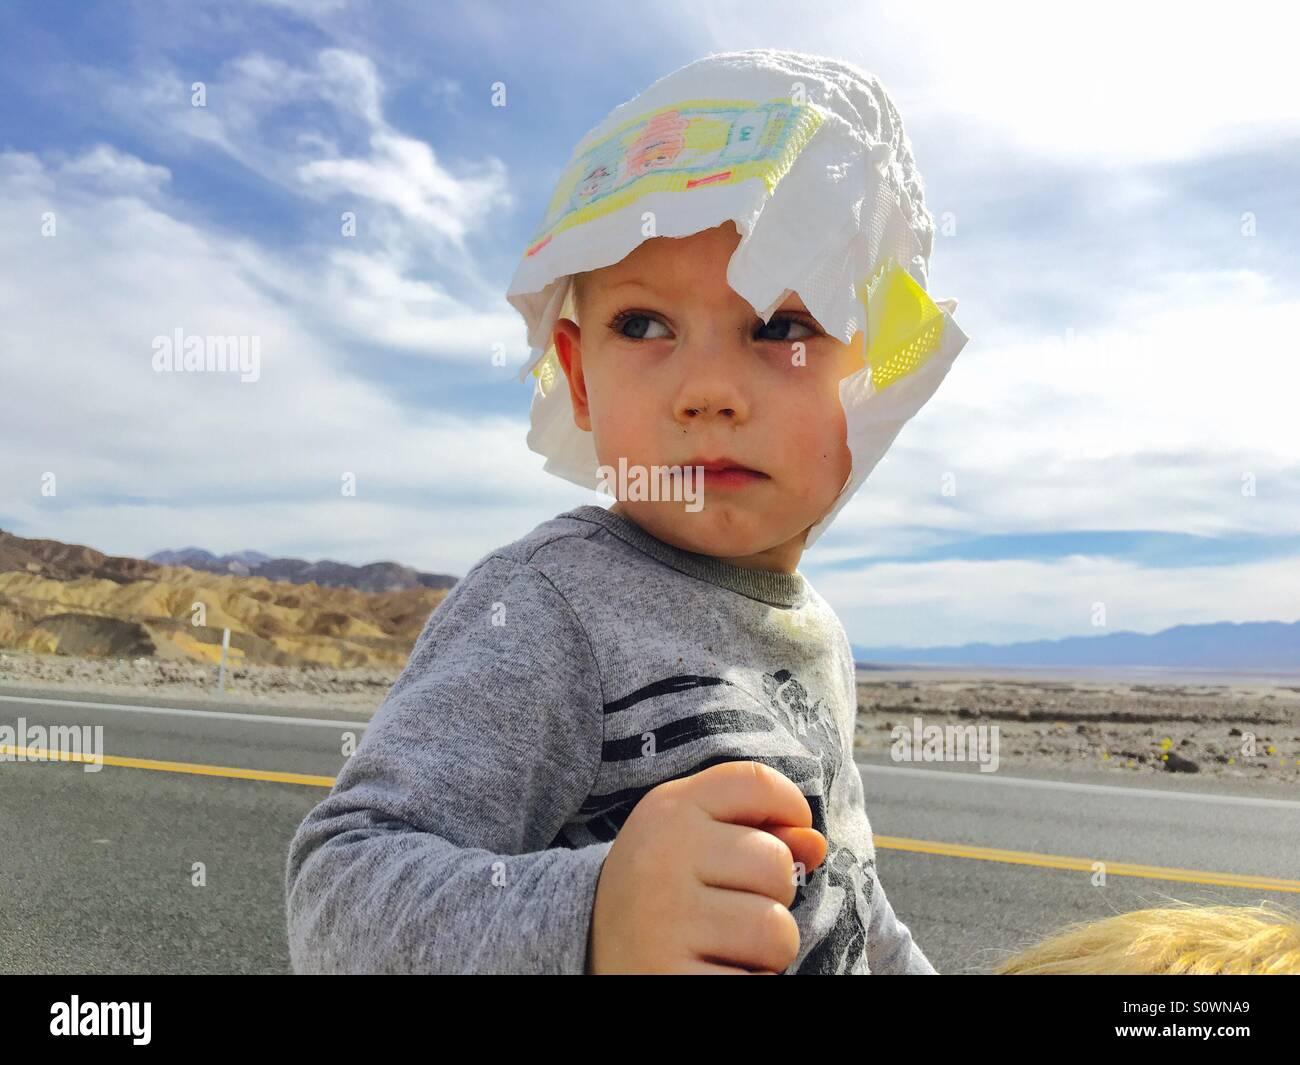 Diaper sunhat! - Stock Image